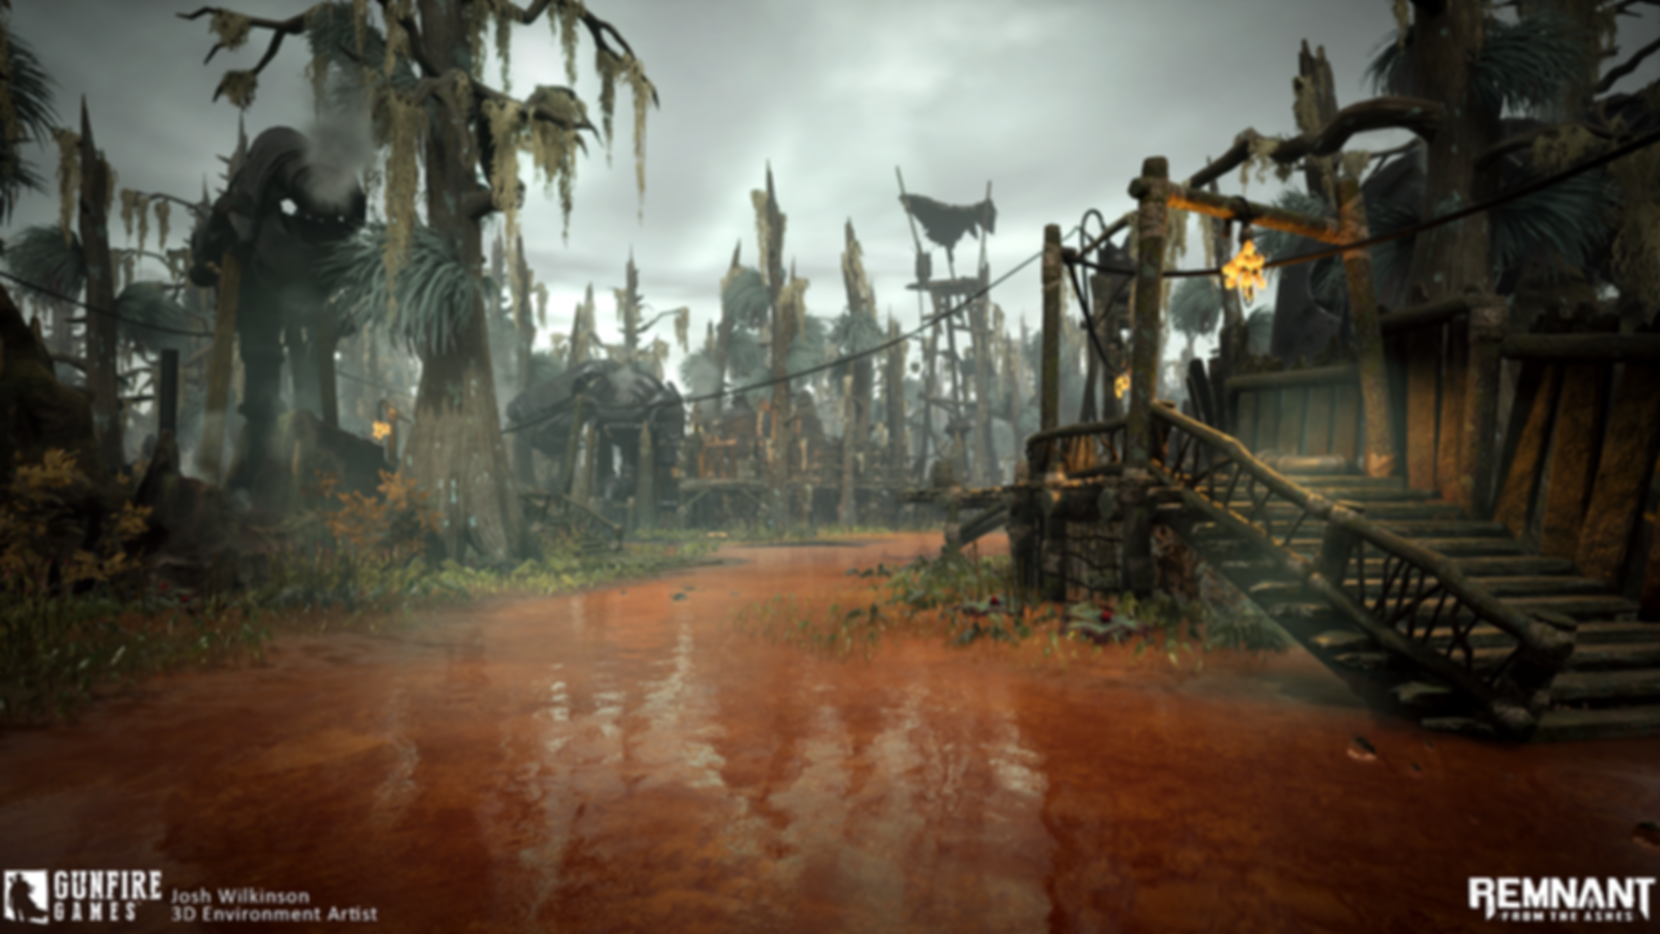 Wilkinson_Swamp_Path.png